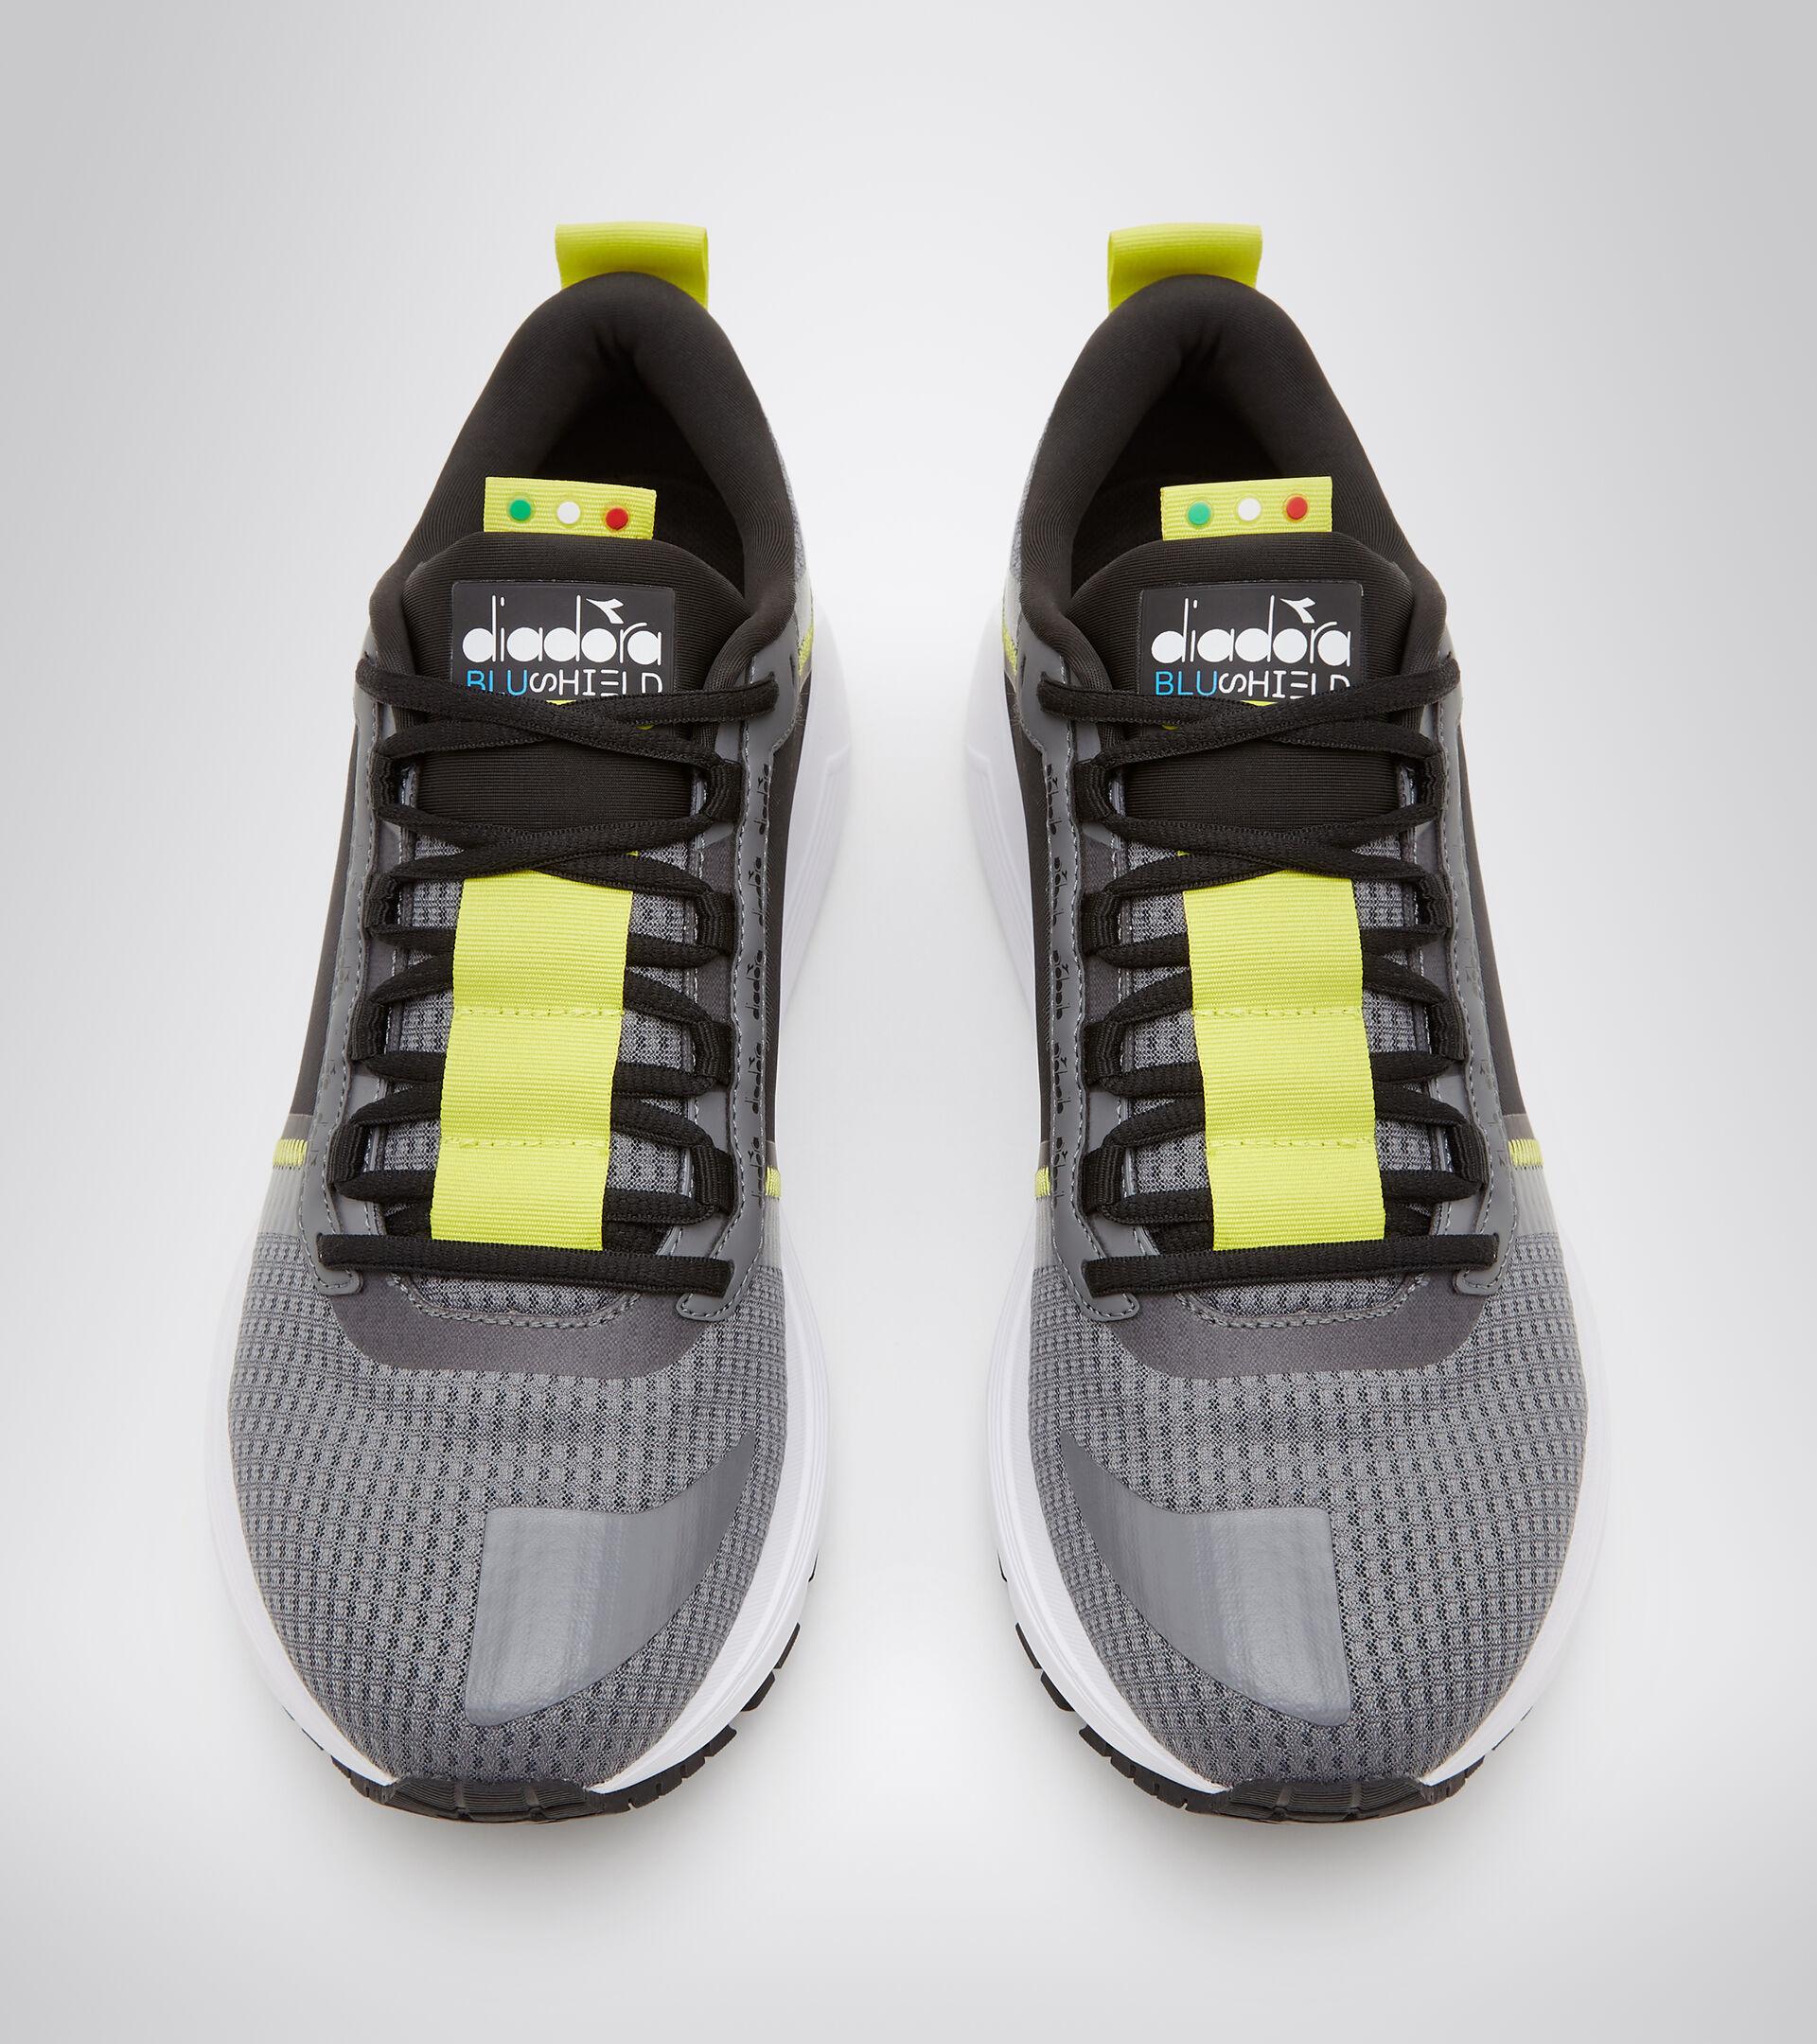 Footwear Sport UOMO MYTHOS BLUSHIELD ELITE TRX 2 STEEL GRAY/BLACK Diadora